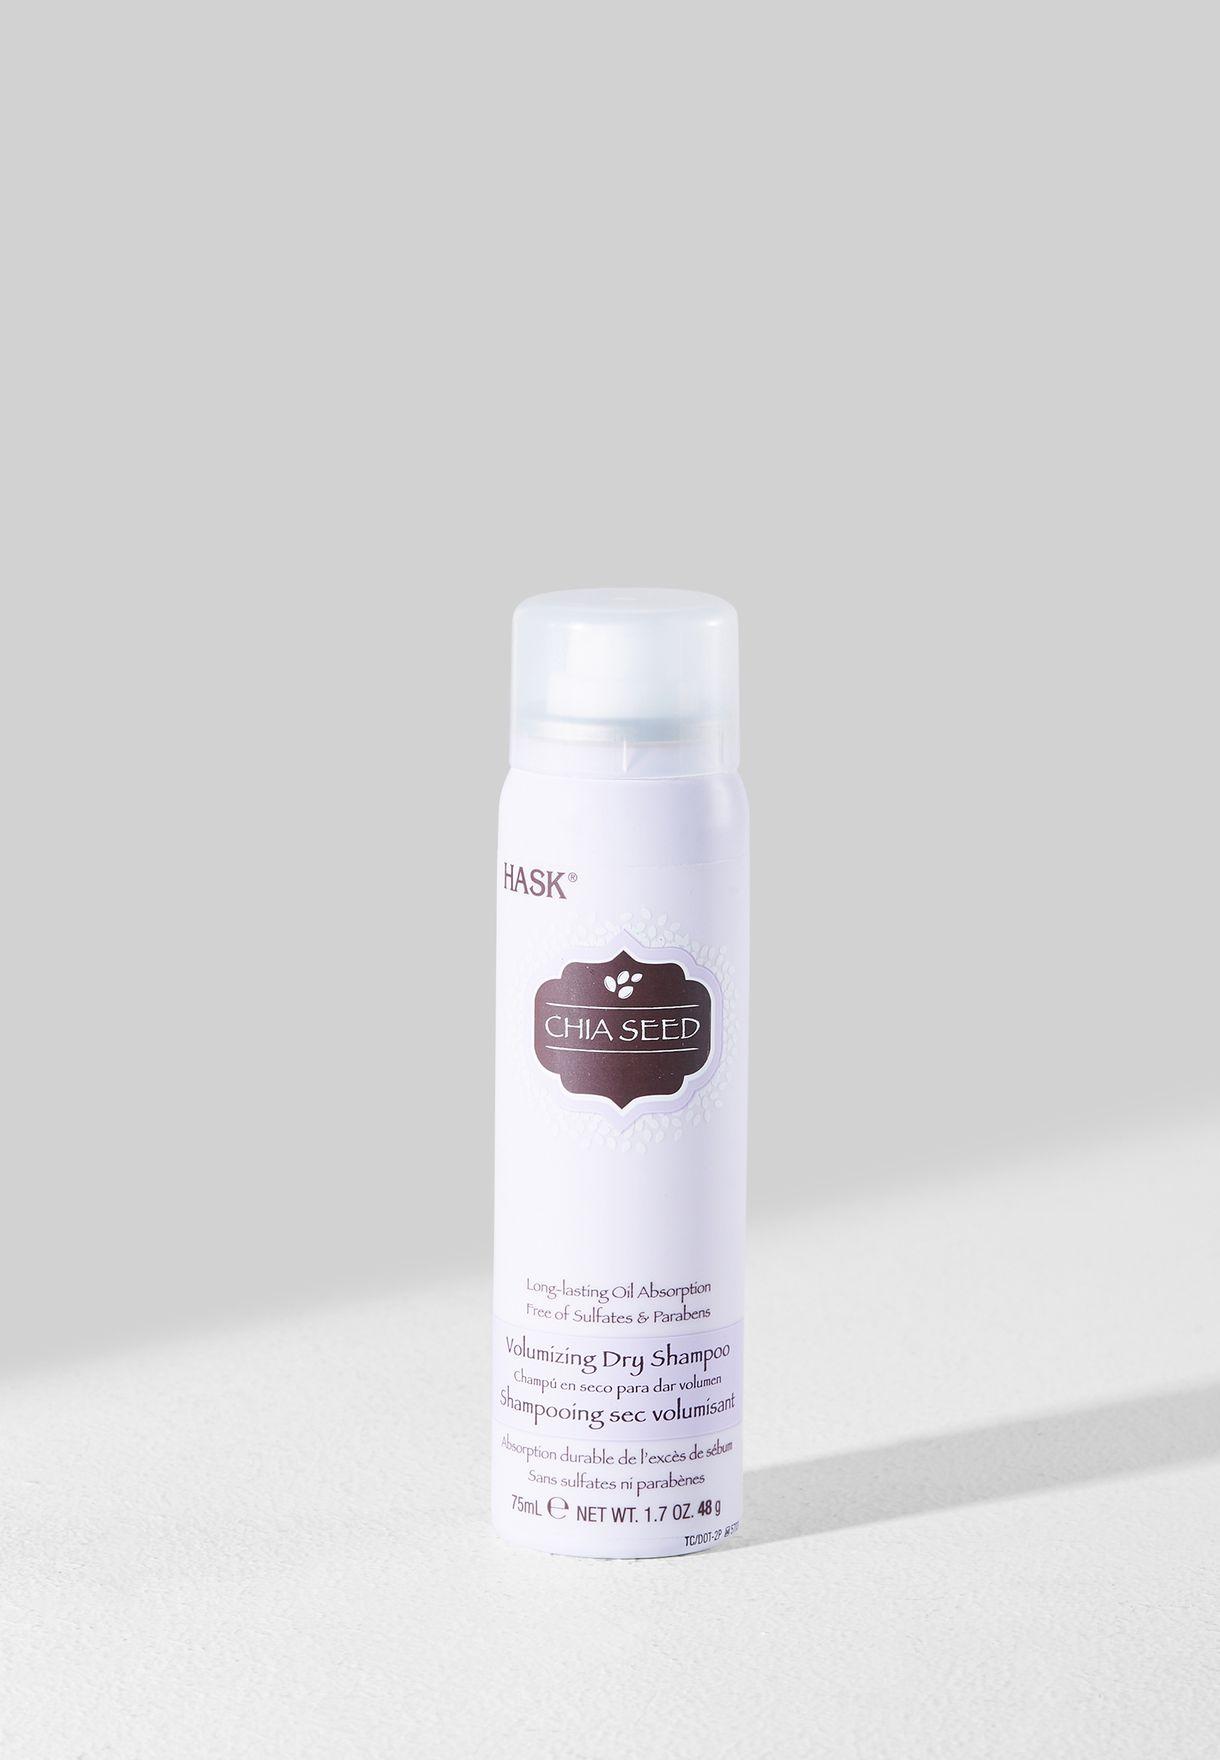 Chia Seed Volumizing Dry Shampoo - Travel Size 75ml